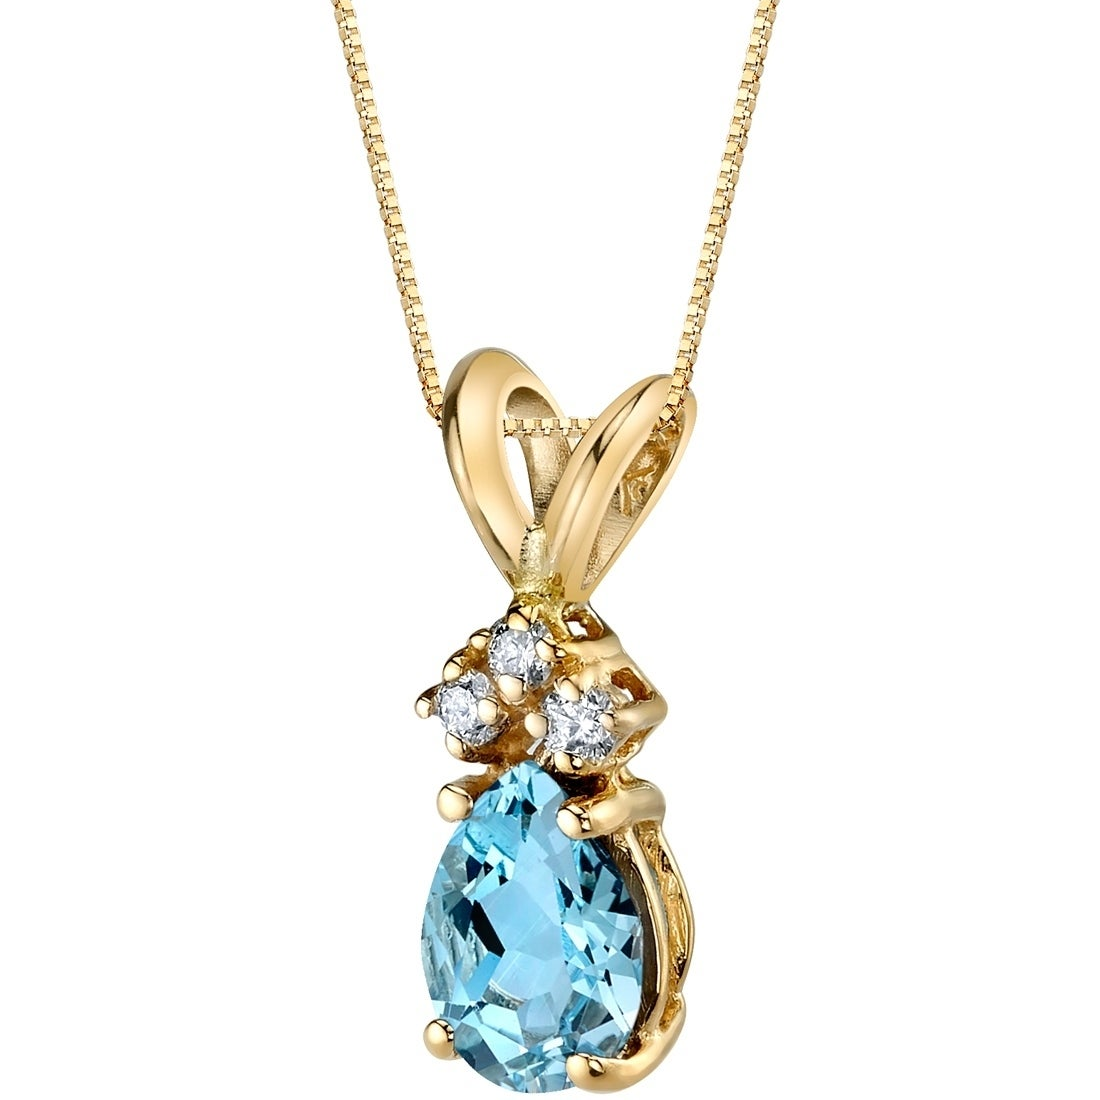 f8cb9c408e2 Shop Oravo 14 Karat Yellow Gold Pear Shape 0.50 Carats Aquamarine Diamond  Pendant - Silver - On Sale - Free Shipping Today - Overstock - 17028232